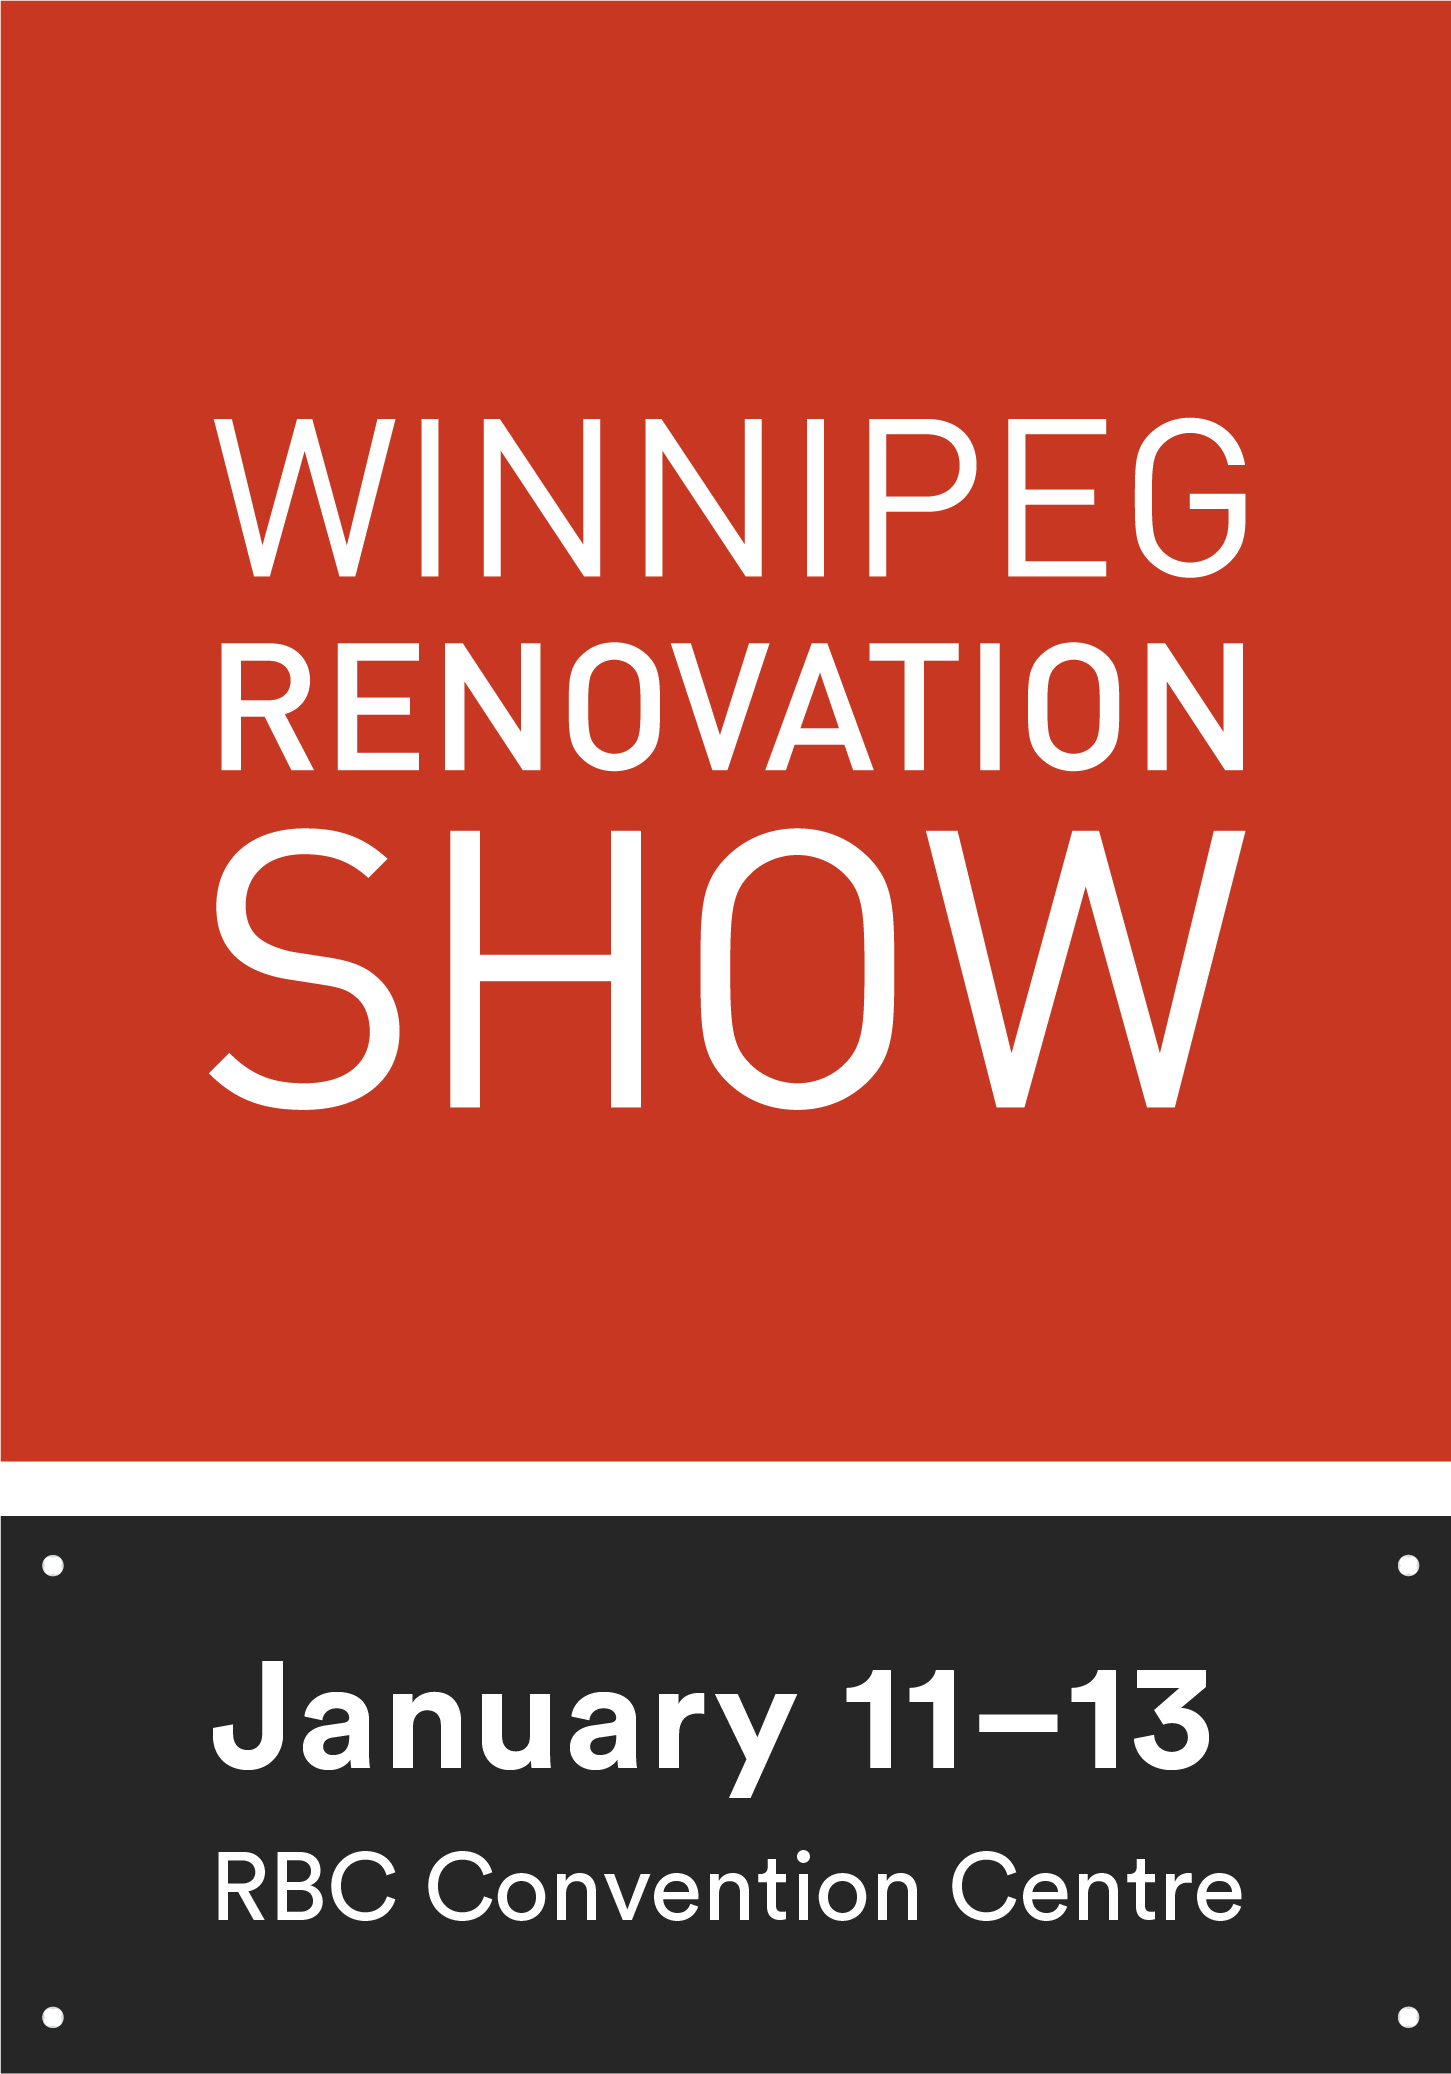 Winnipeg Renovation Show